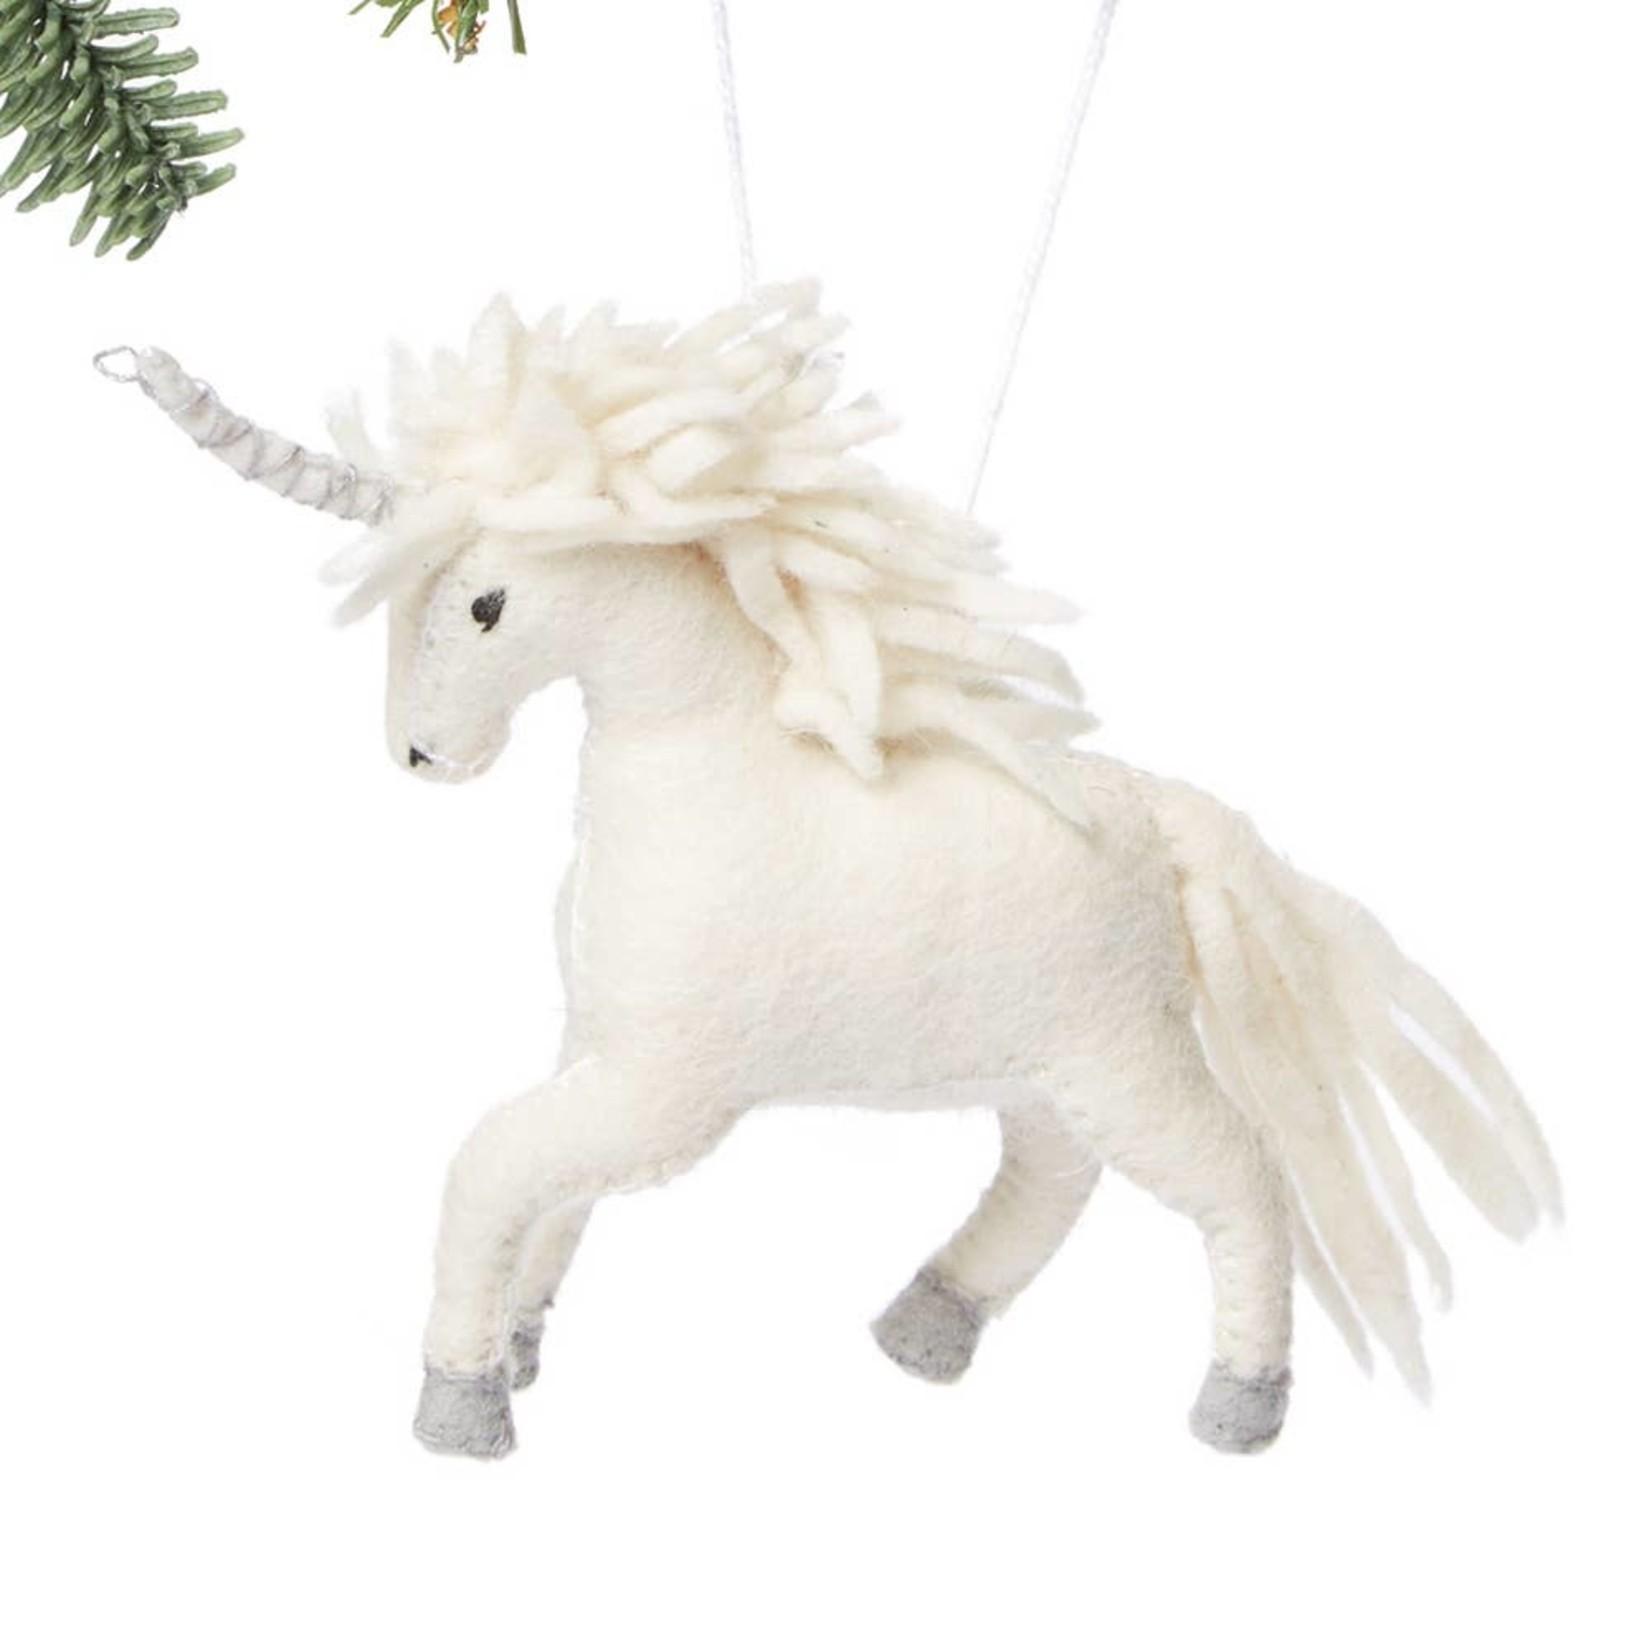 Silk Road Unicorn